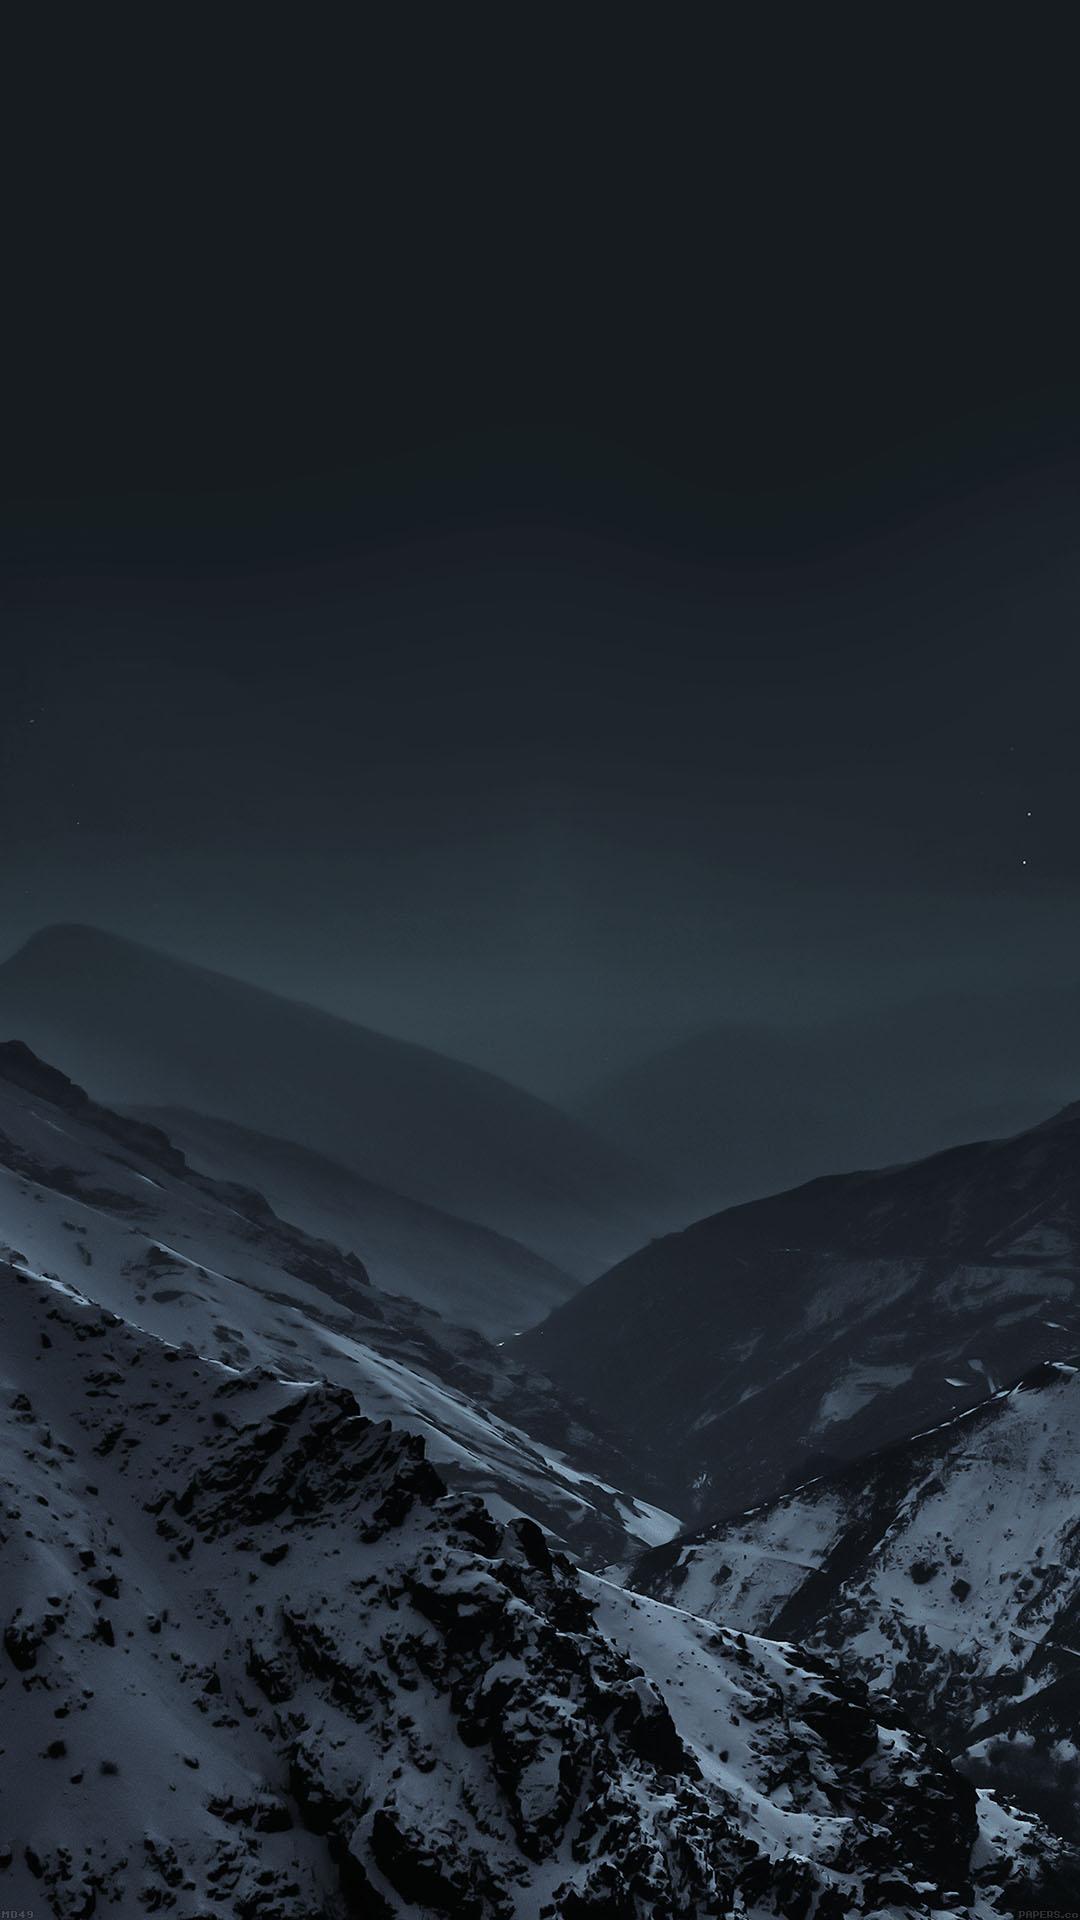 Md49 Wallpaper Nature Earth Dark Asleep Mountain Night Wallpaper